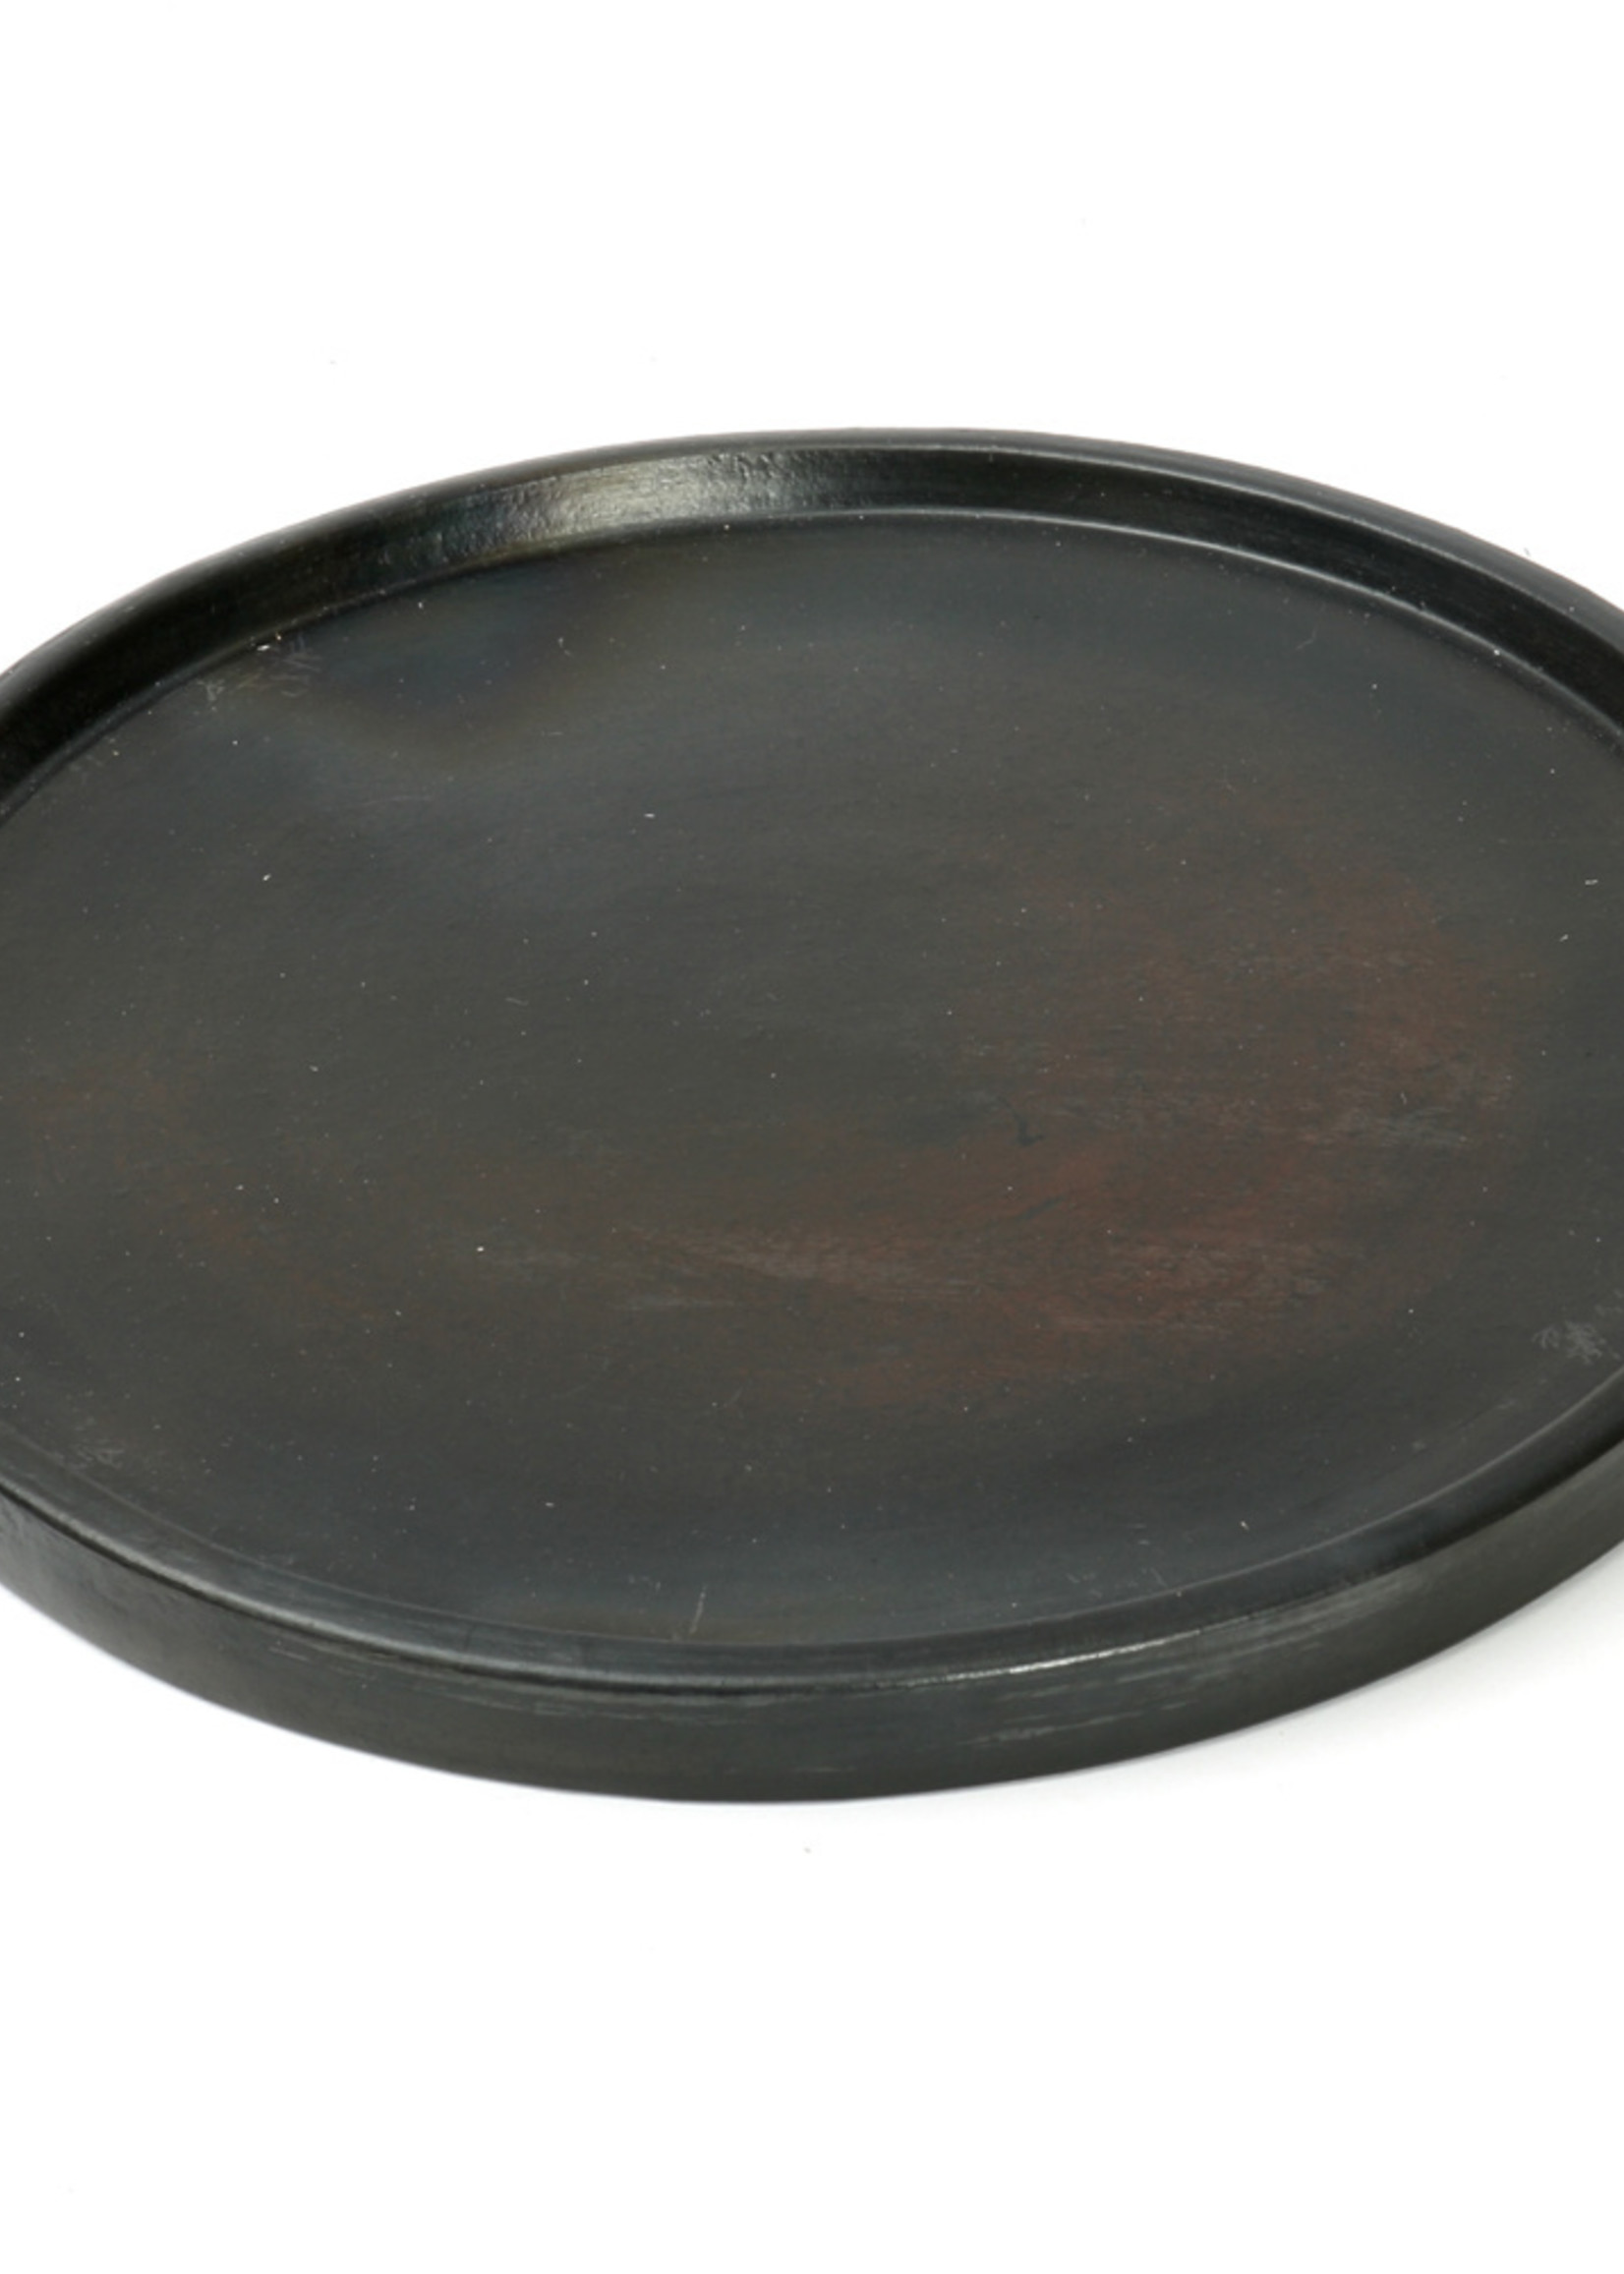 The Terracotta Burned Plate - Black - L